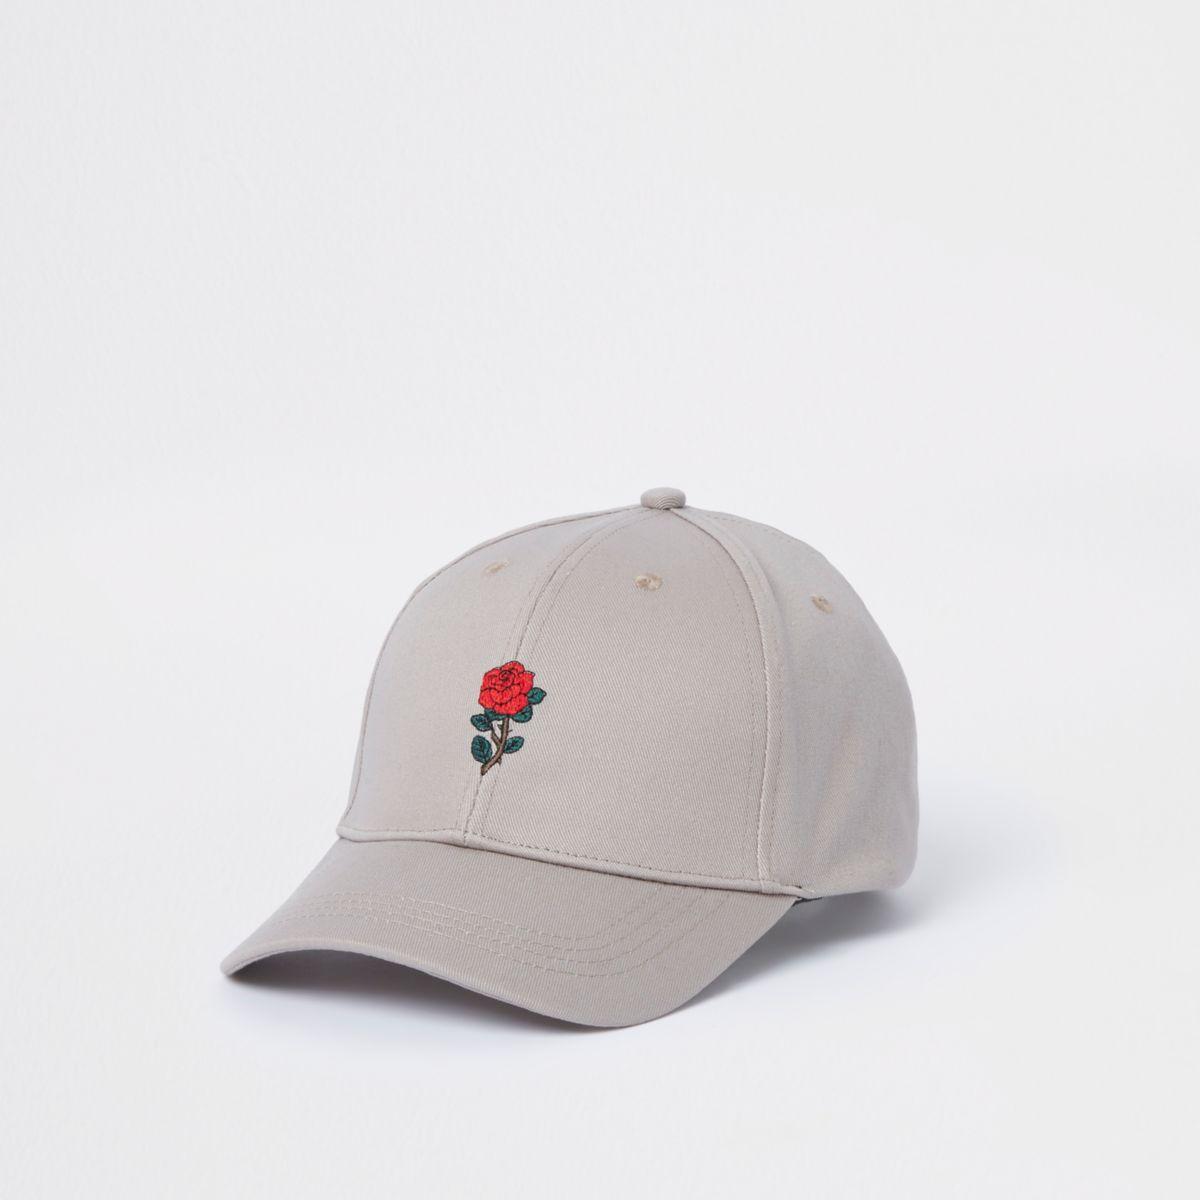 Casquette de baseball beige motif rose